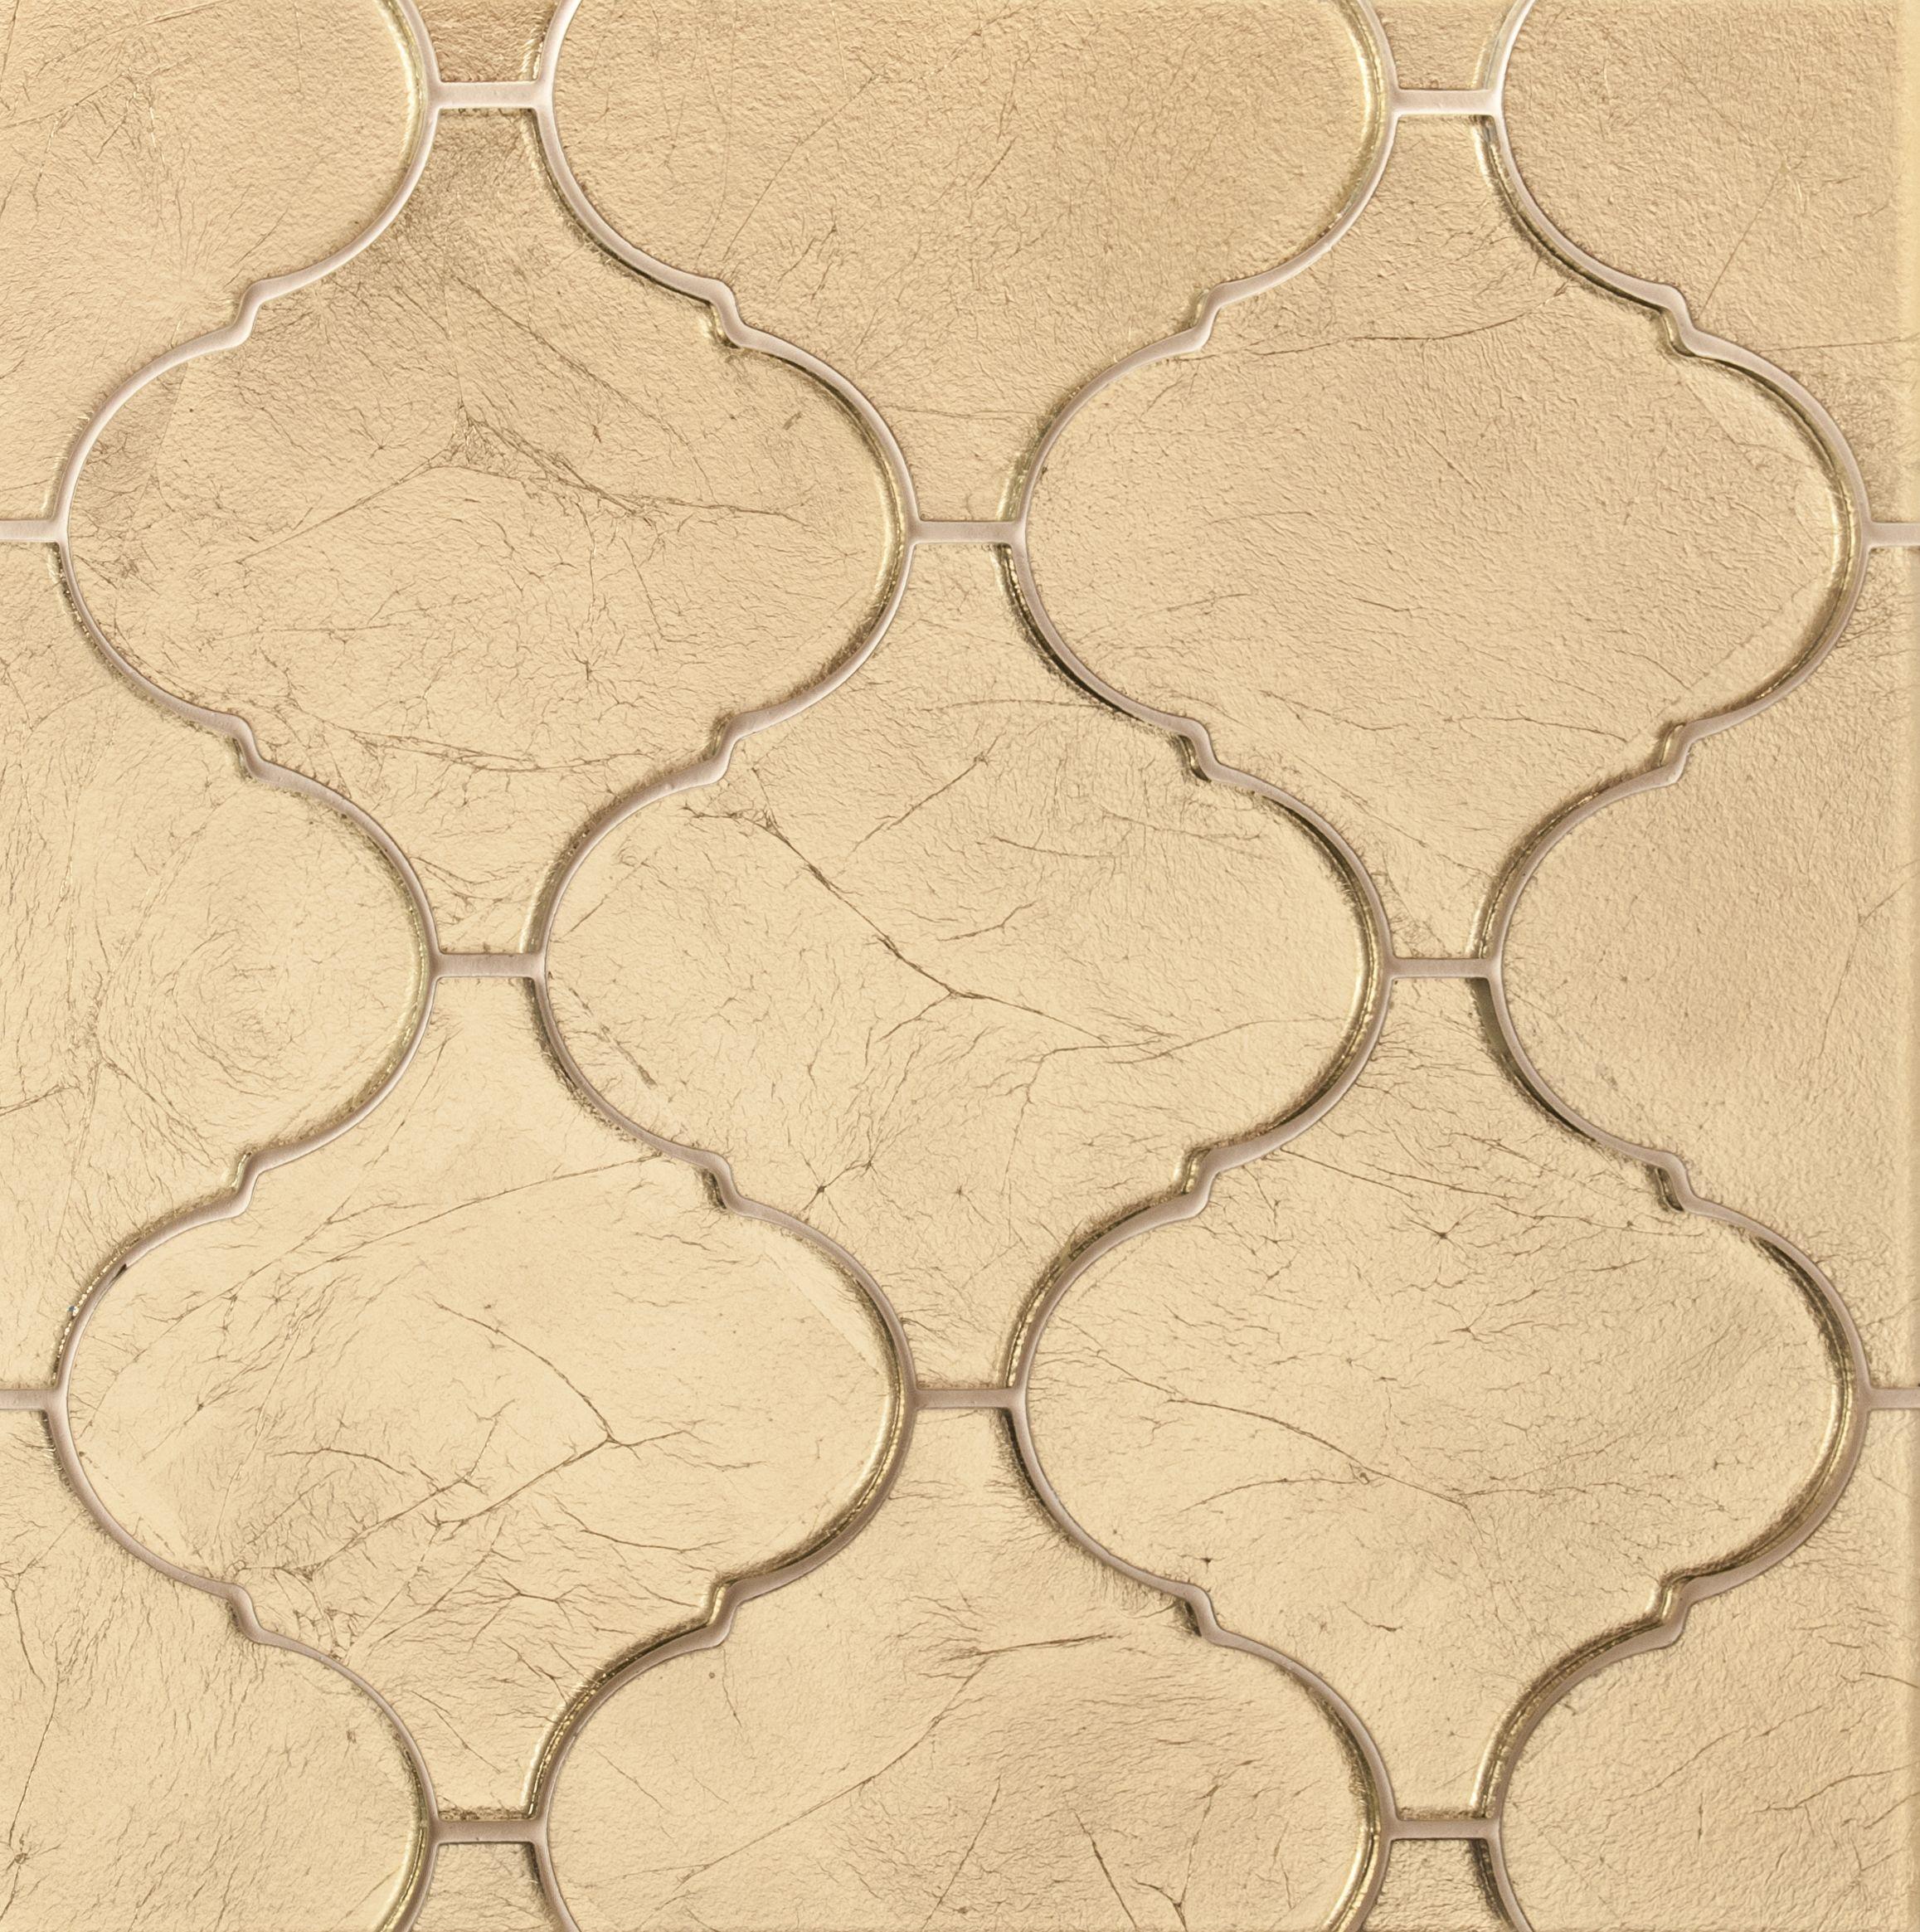 Magnificent 12X12 Ceiling Tiles Asbestos Small 12X24 Tile Floor Solid 13X13 Ceramic Tile 2 Inch Ceramic Tile Old 2X2 Black Ceiling Tiles Green3D Ceramic Tile Ann Sacks Glass Tile Backsplash Kitchen Ann Sacks Glass Tile ..